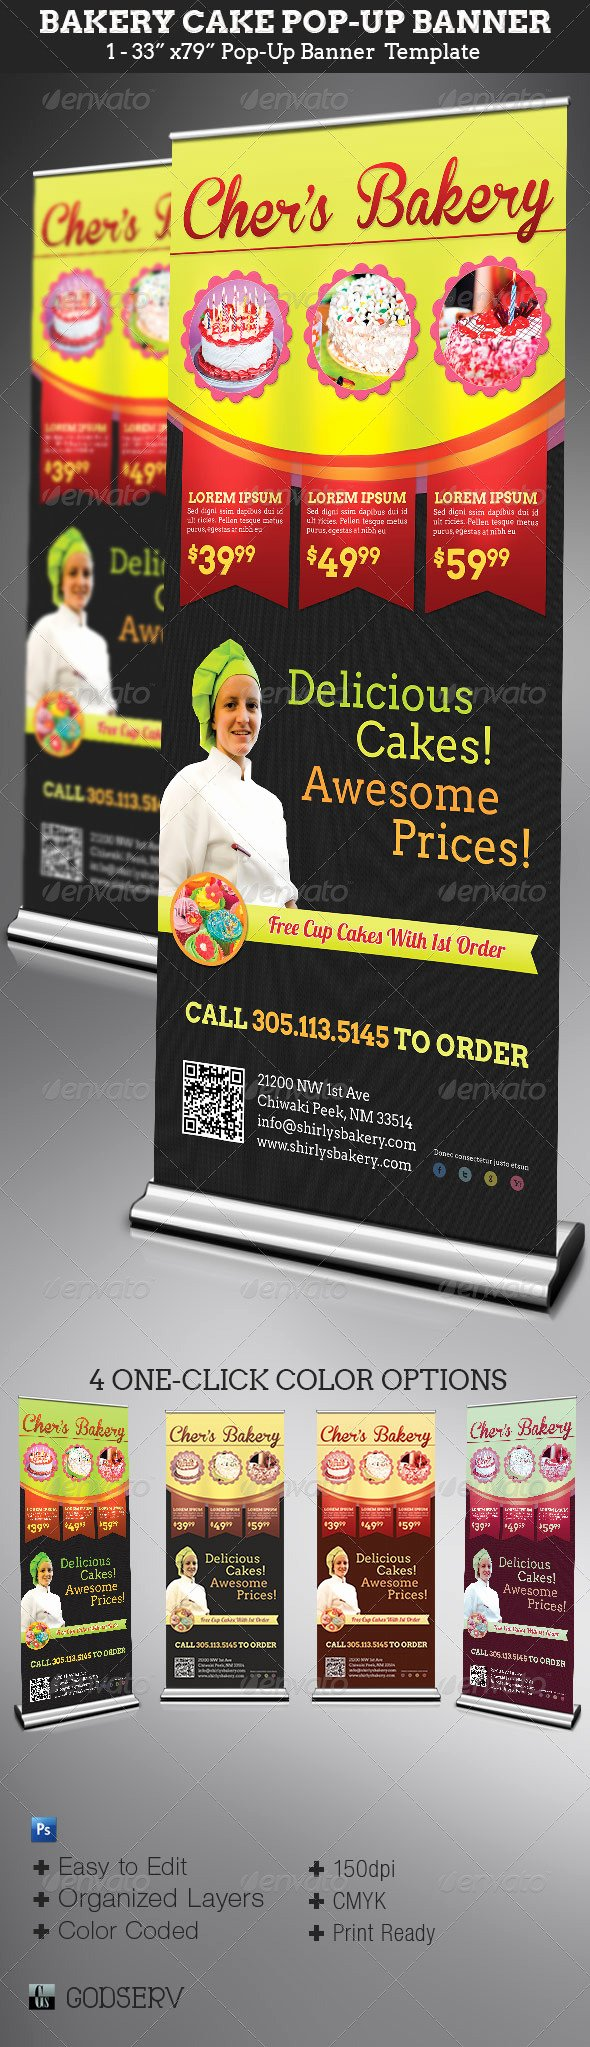 Pop Up Banner Template New Bakery Cake Pop Up Banner Template